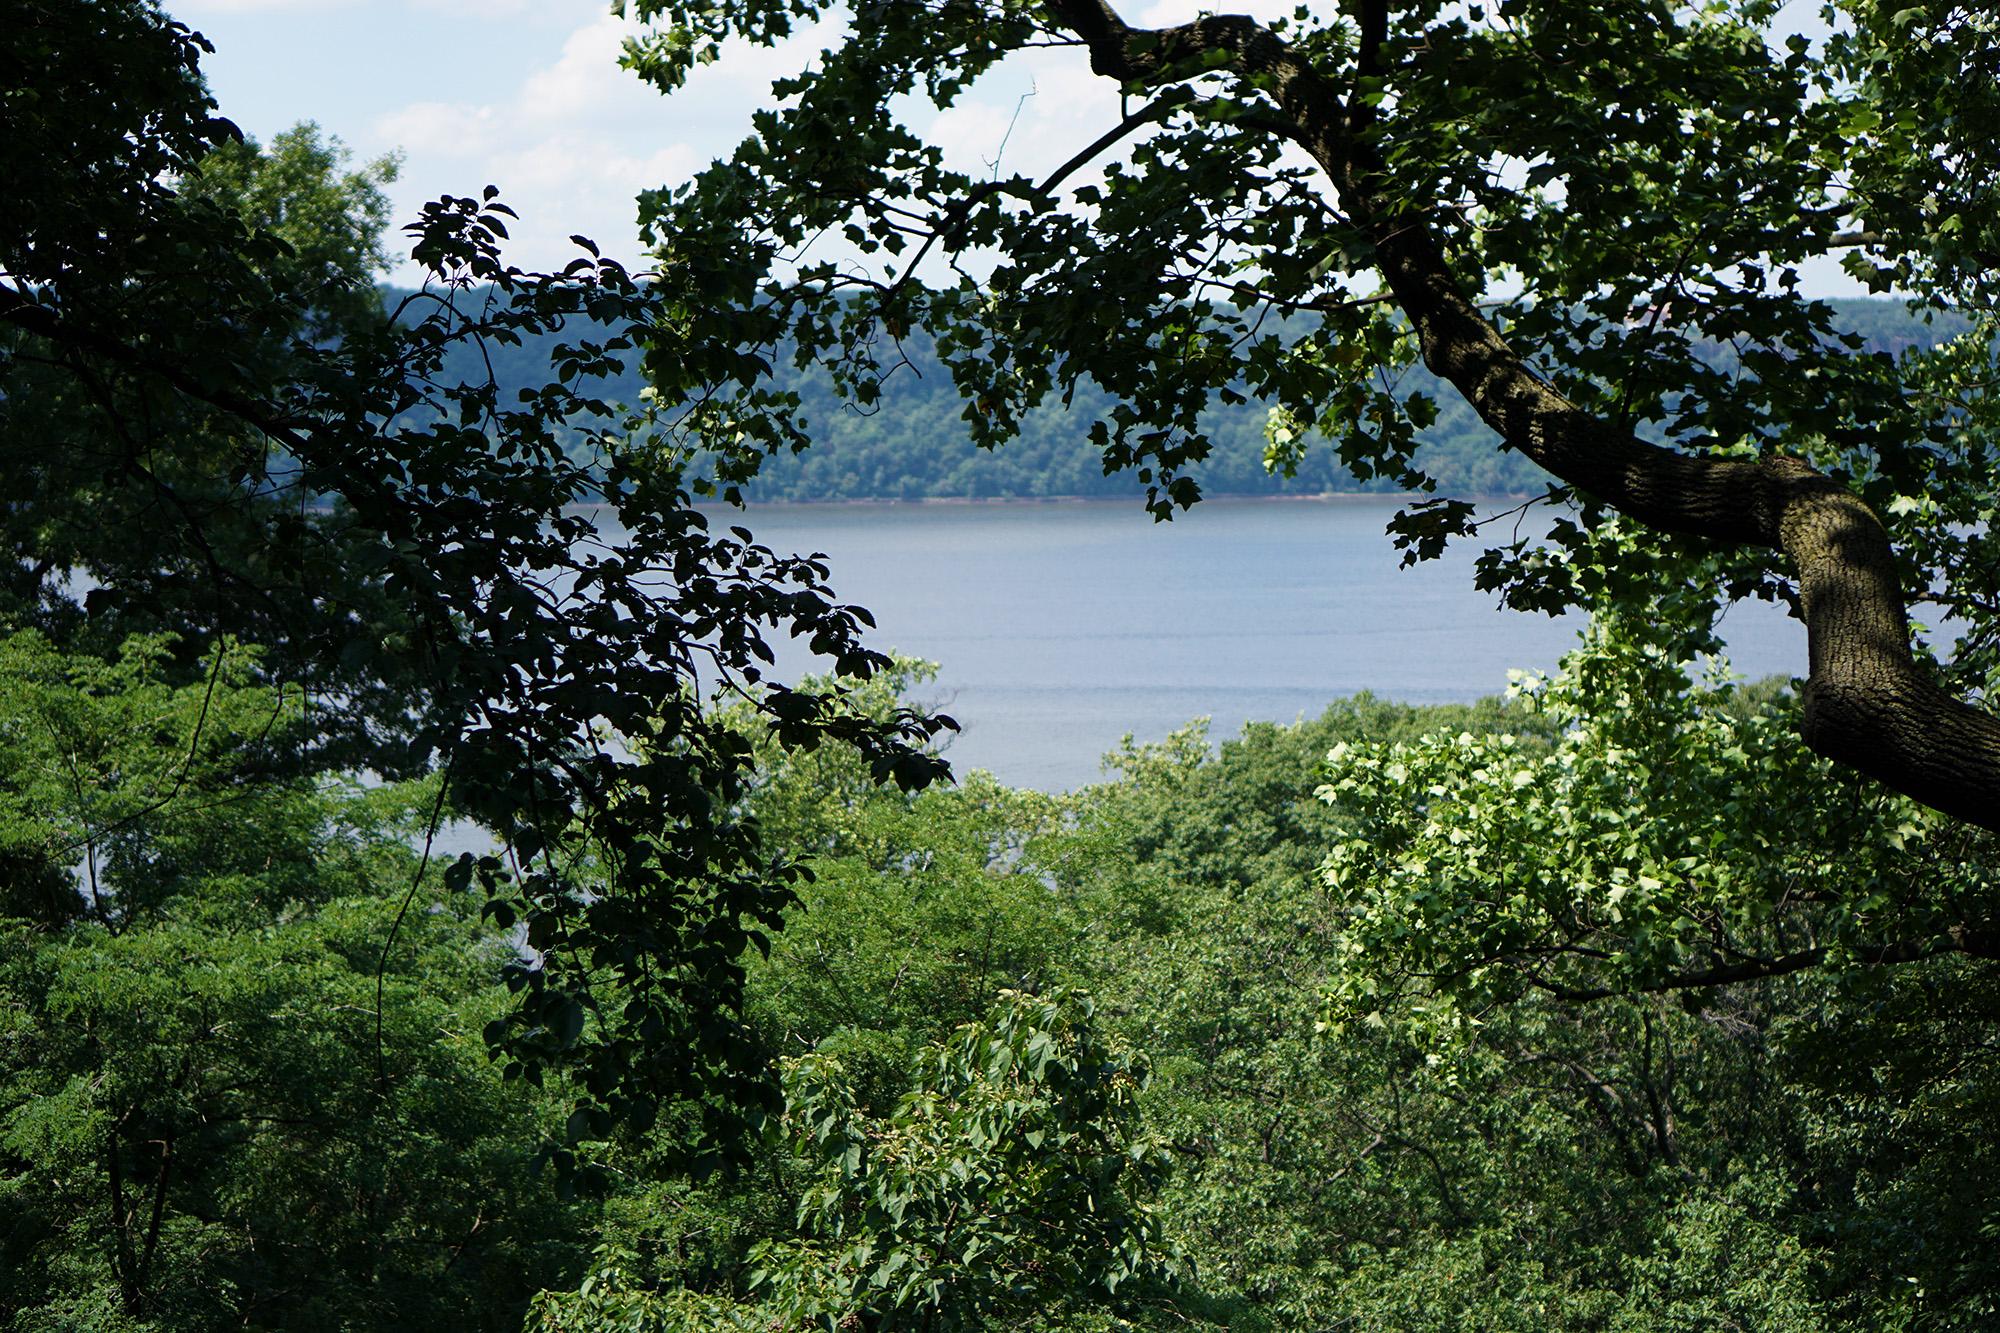 Hudson River off 190th St, NYC / Darker than Green